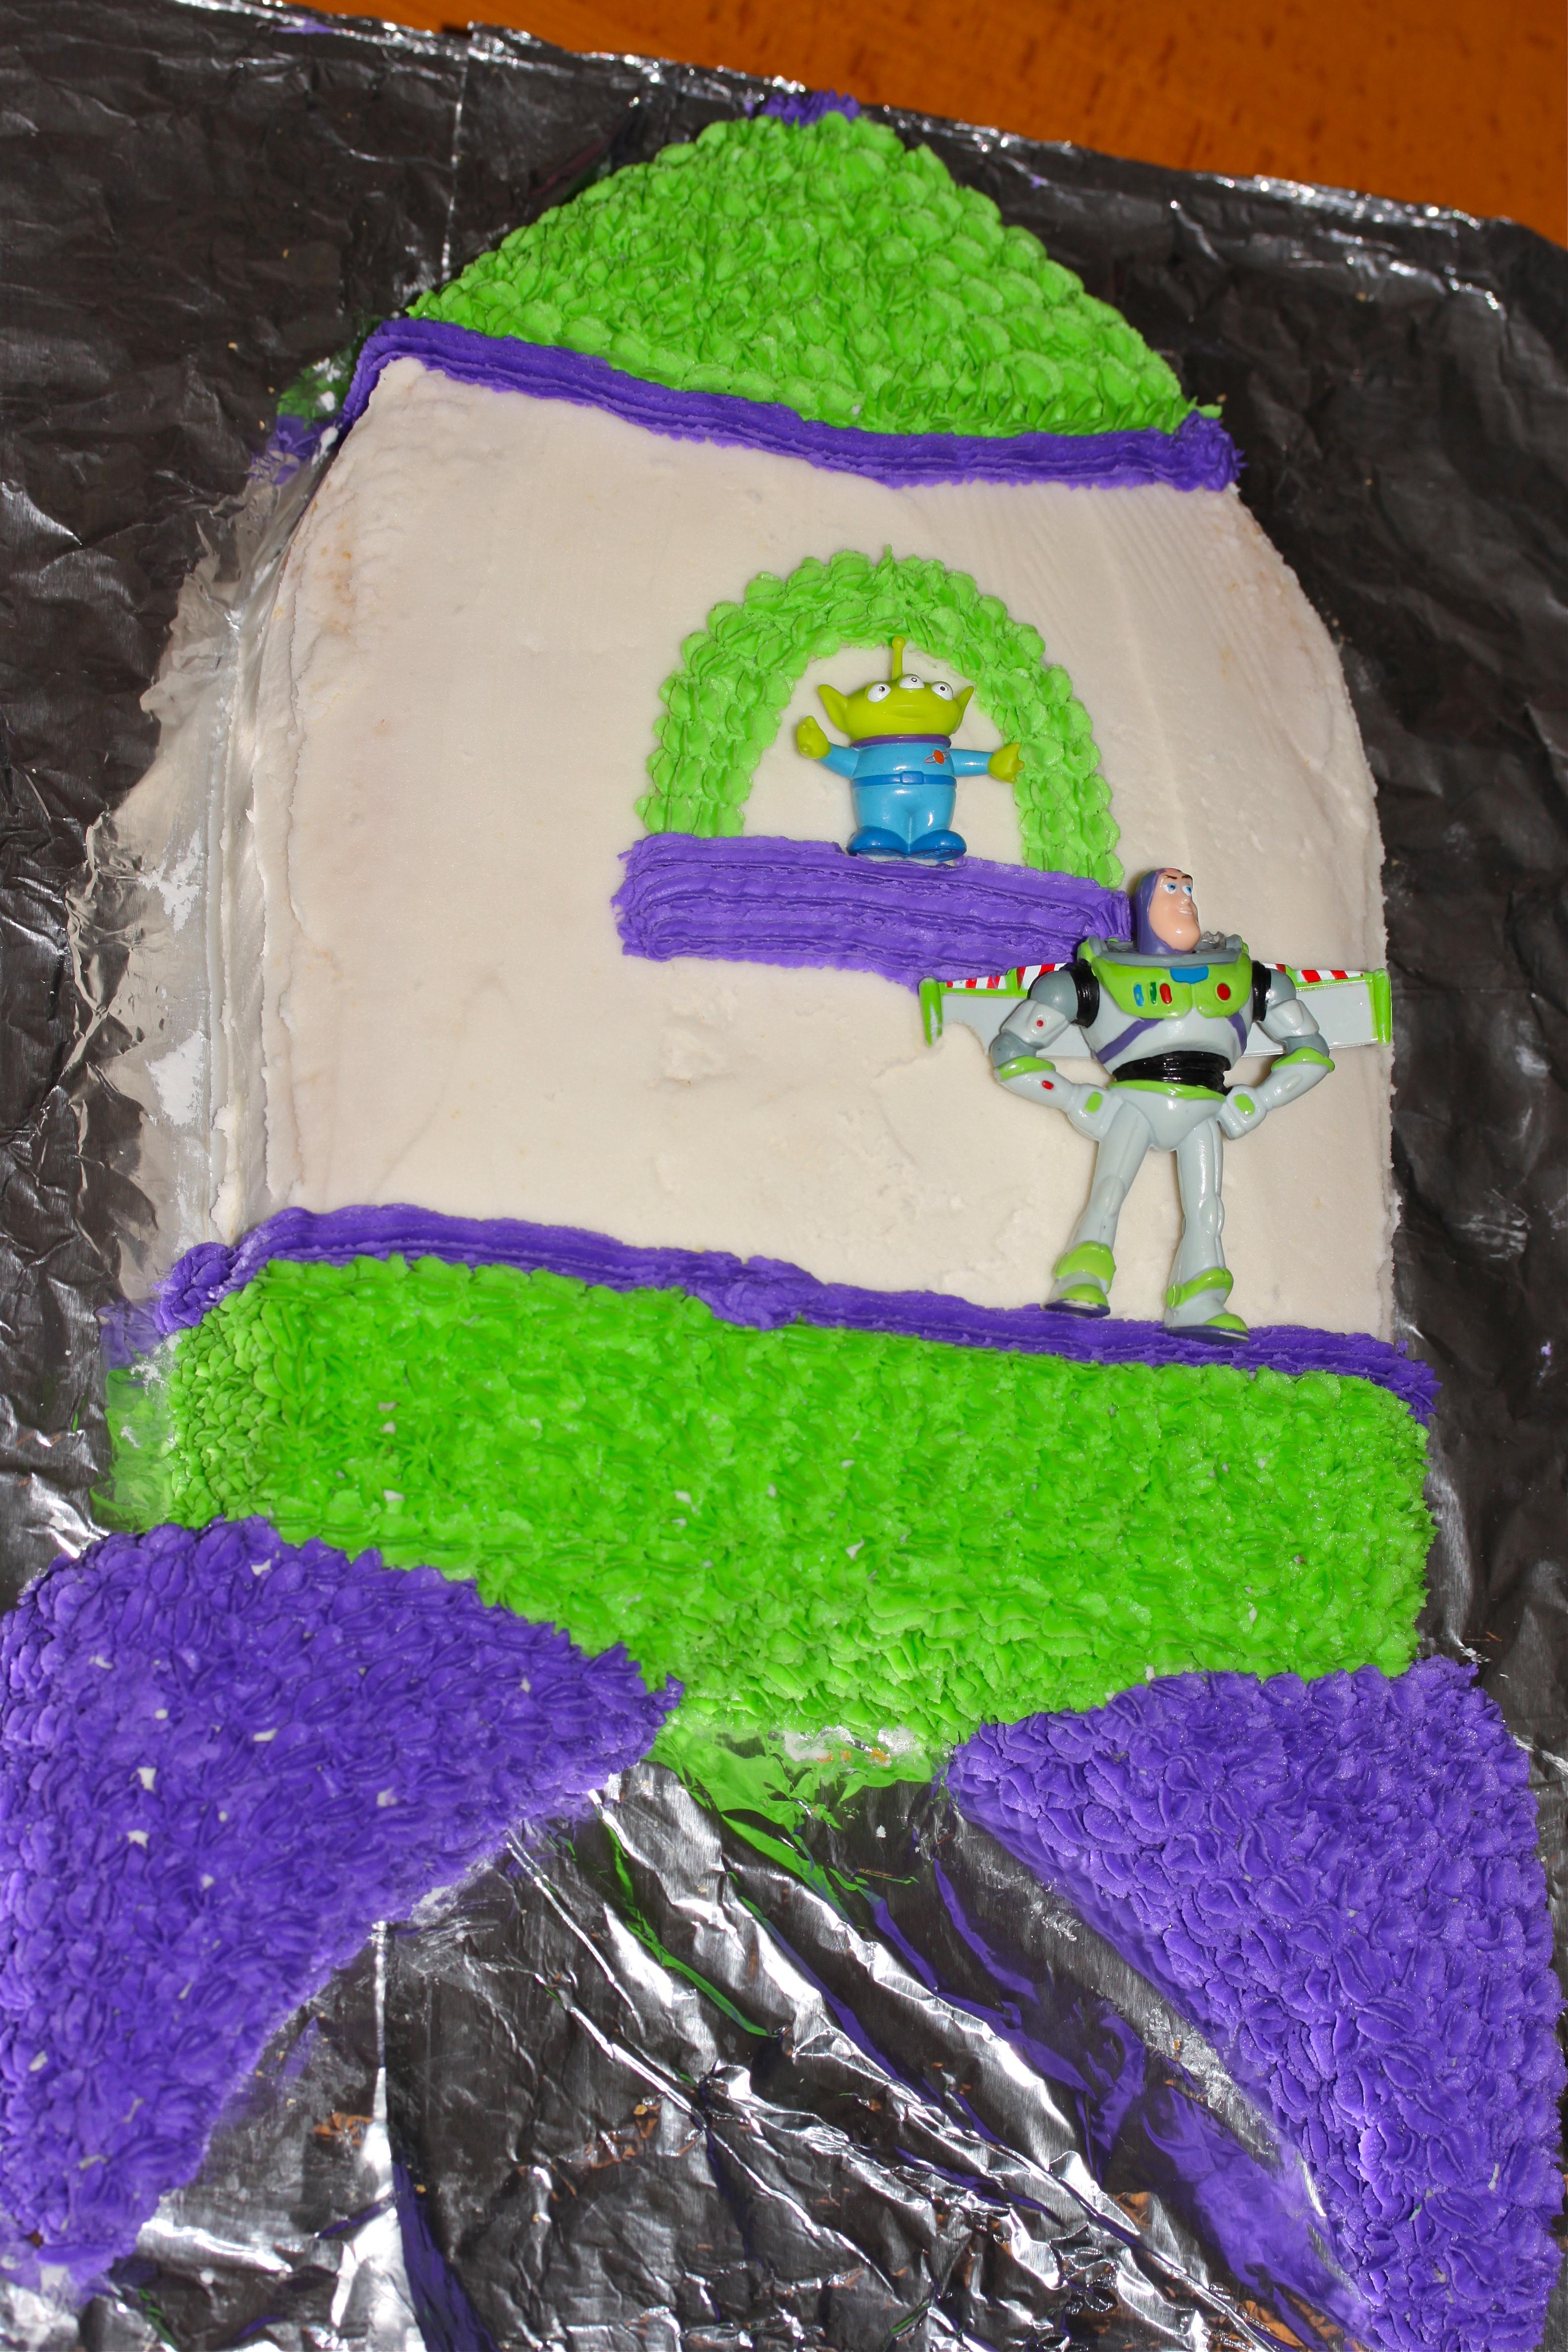 Disney Parties Buzz Lightyear Space Ranger Cake